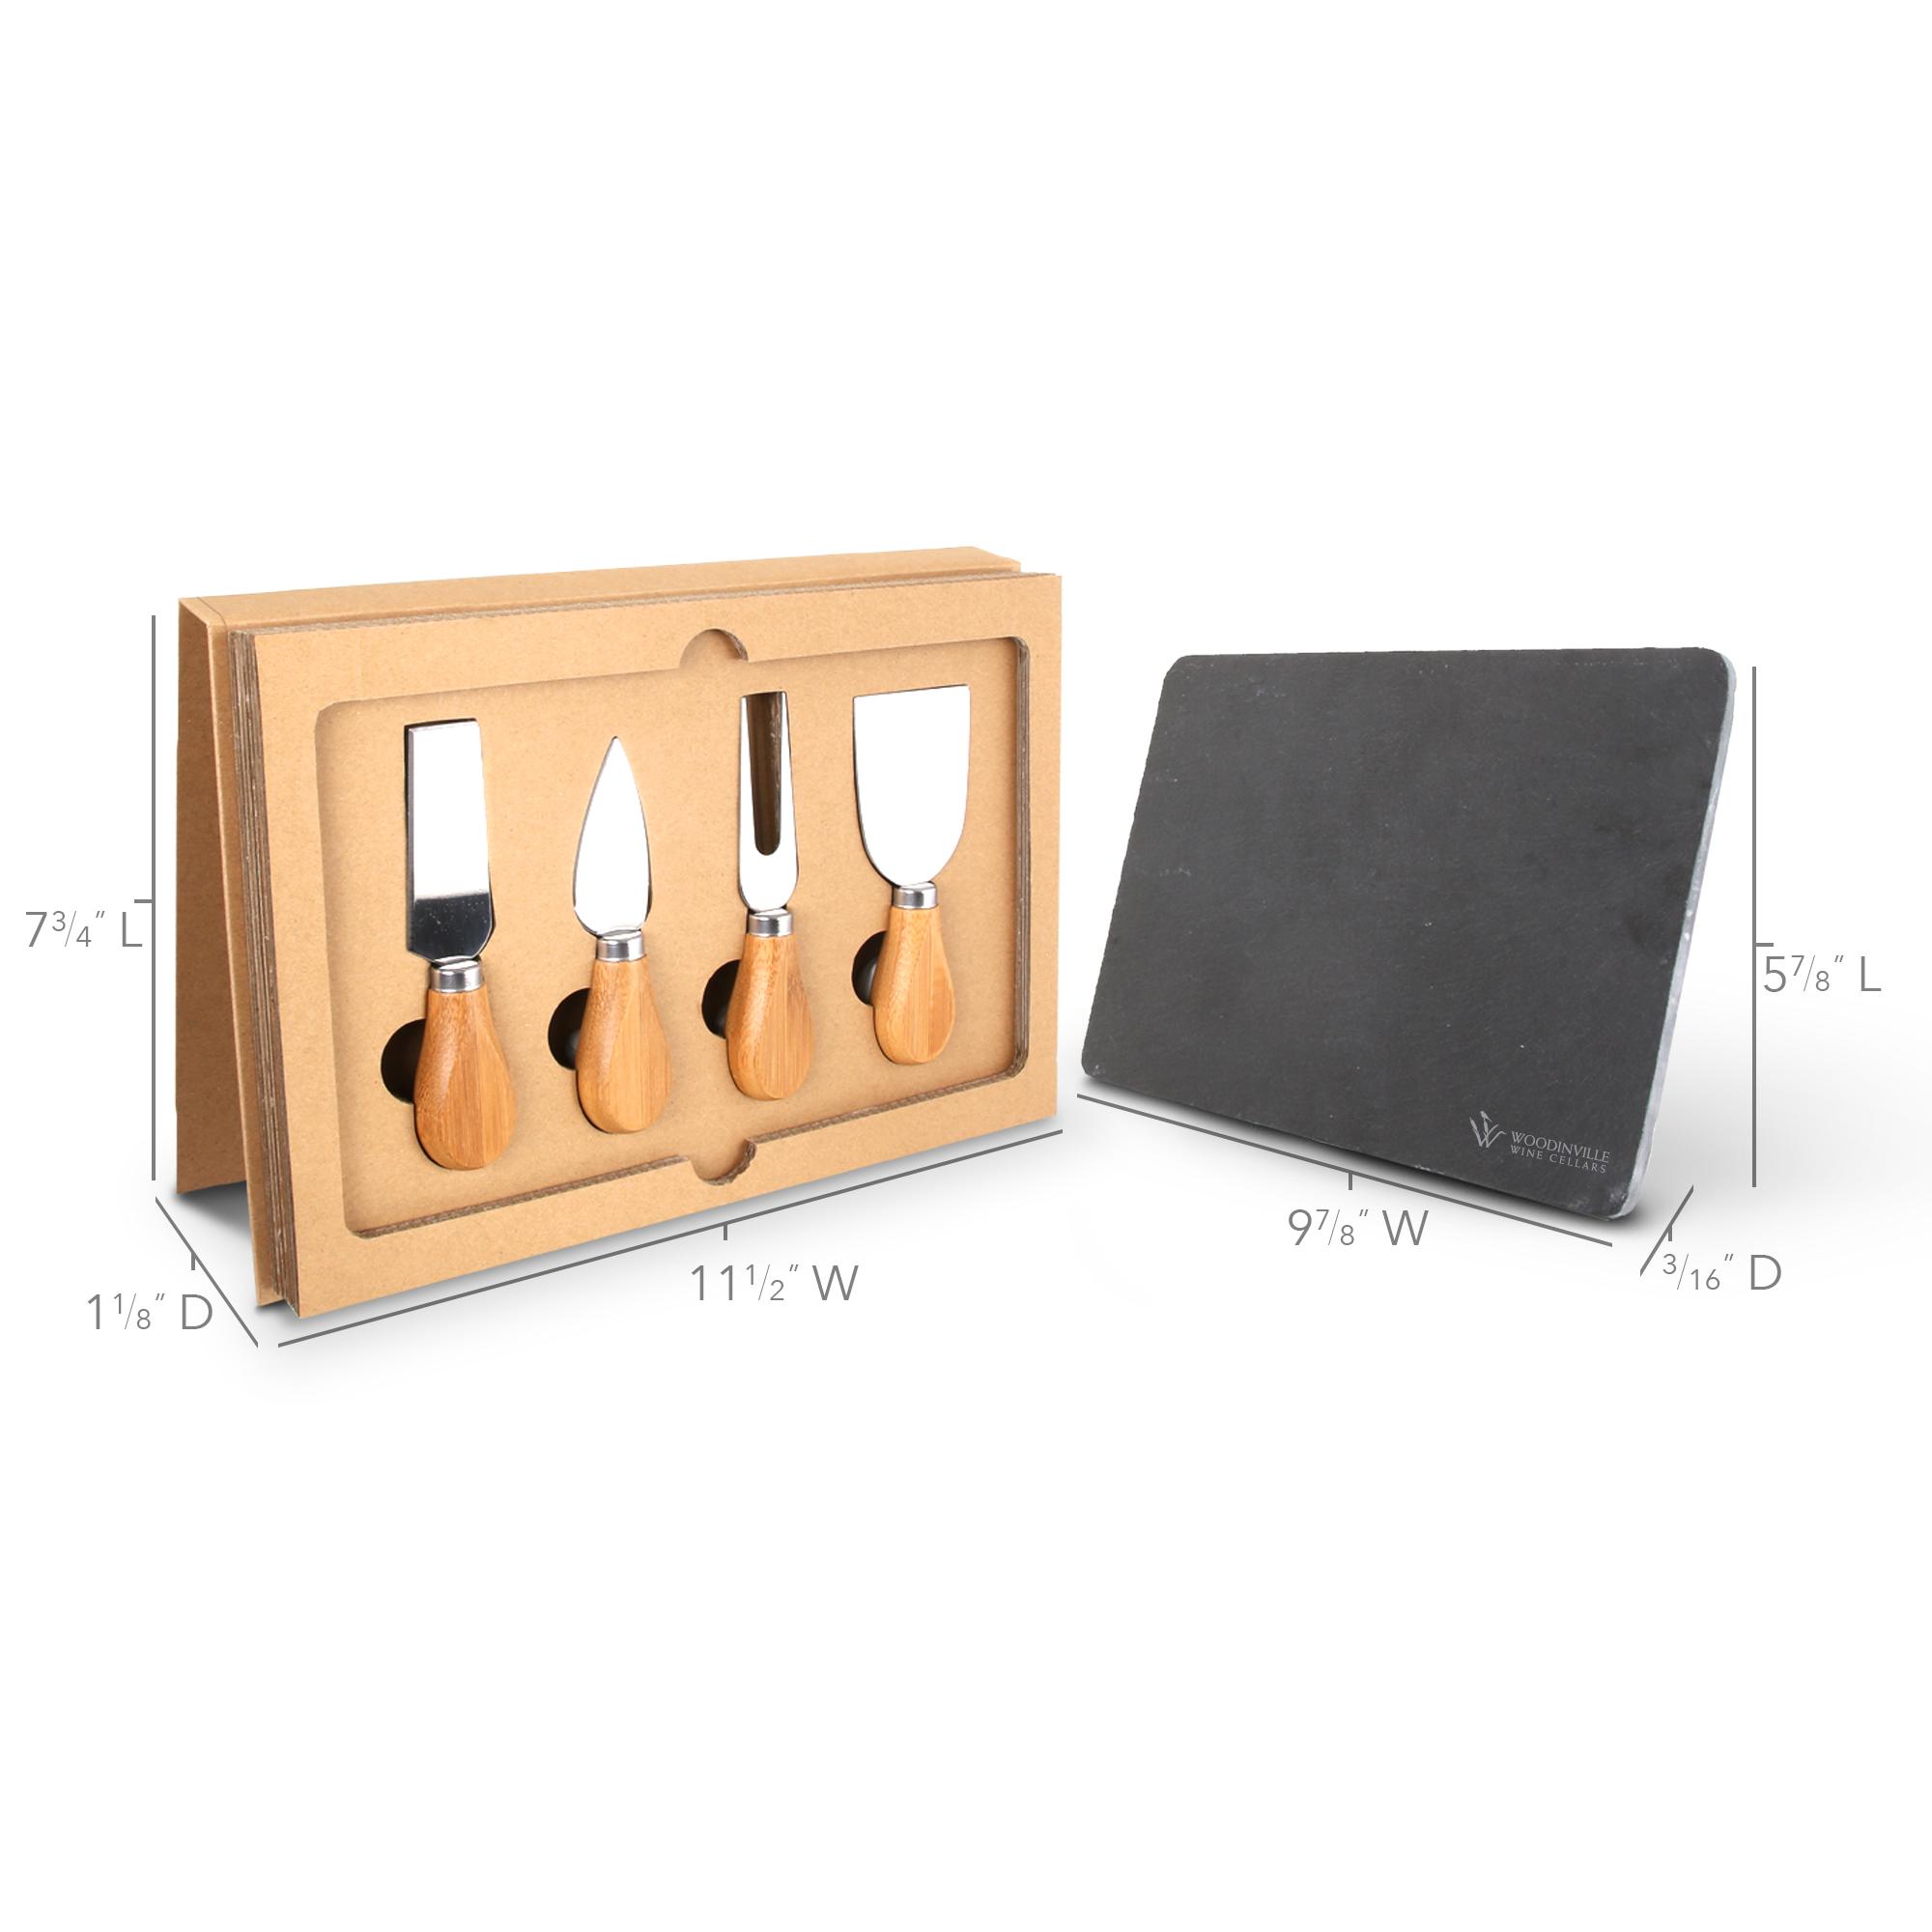 BA-67 5-Piece Cheese Knife Set & Slate Cutting Board w/ Gift Box